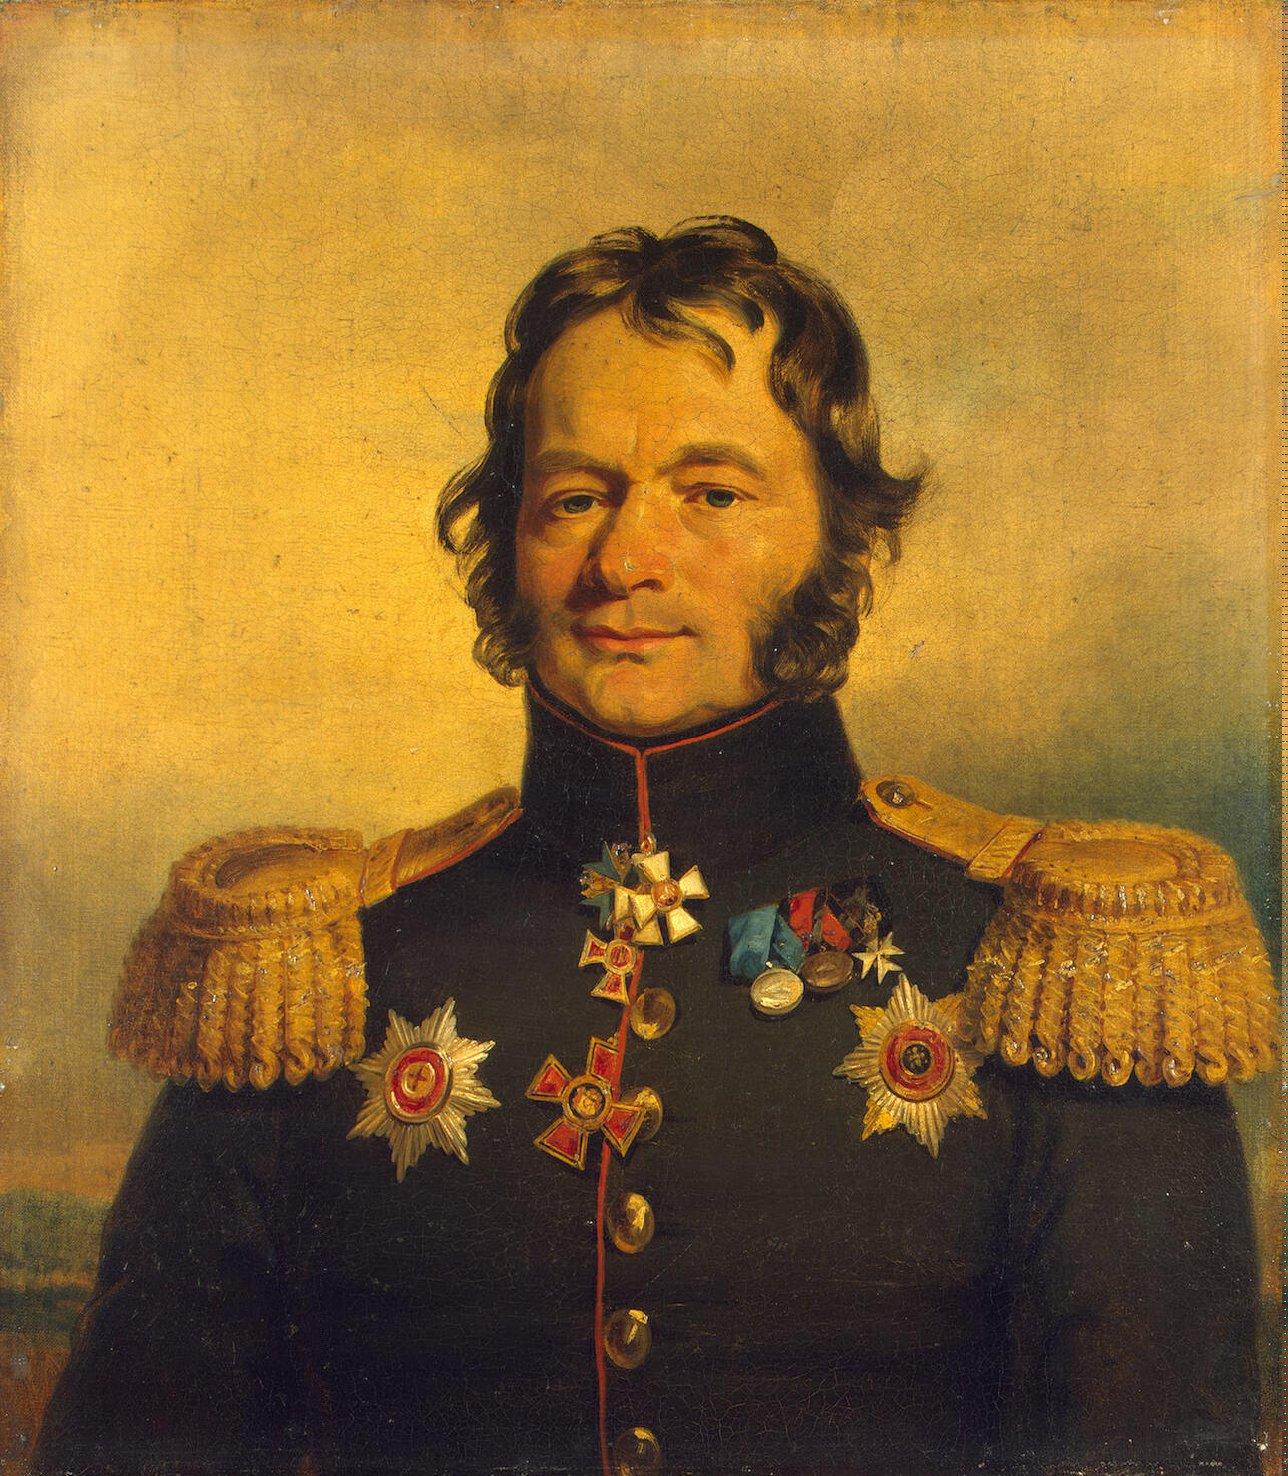 Костенецкий, Василий Григорьевич